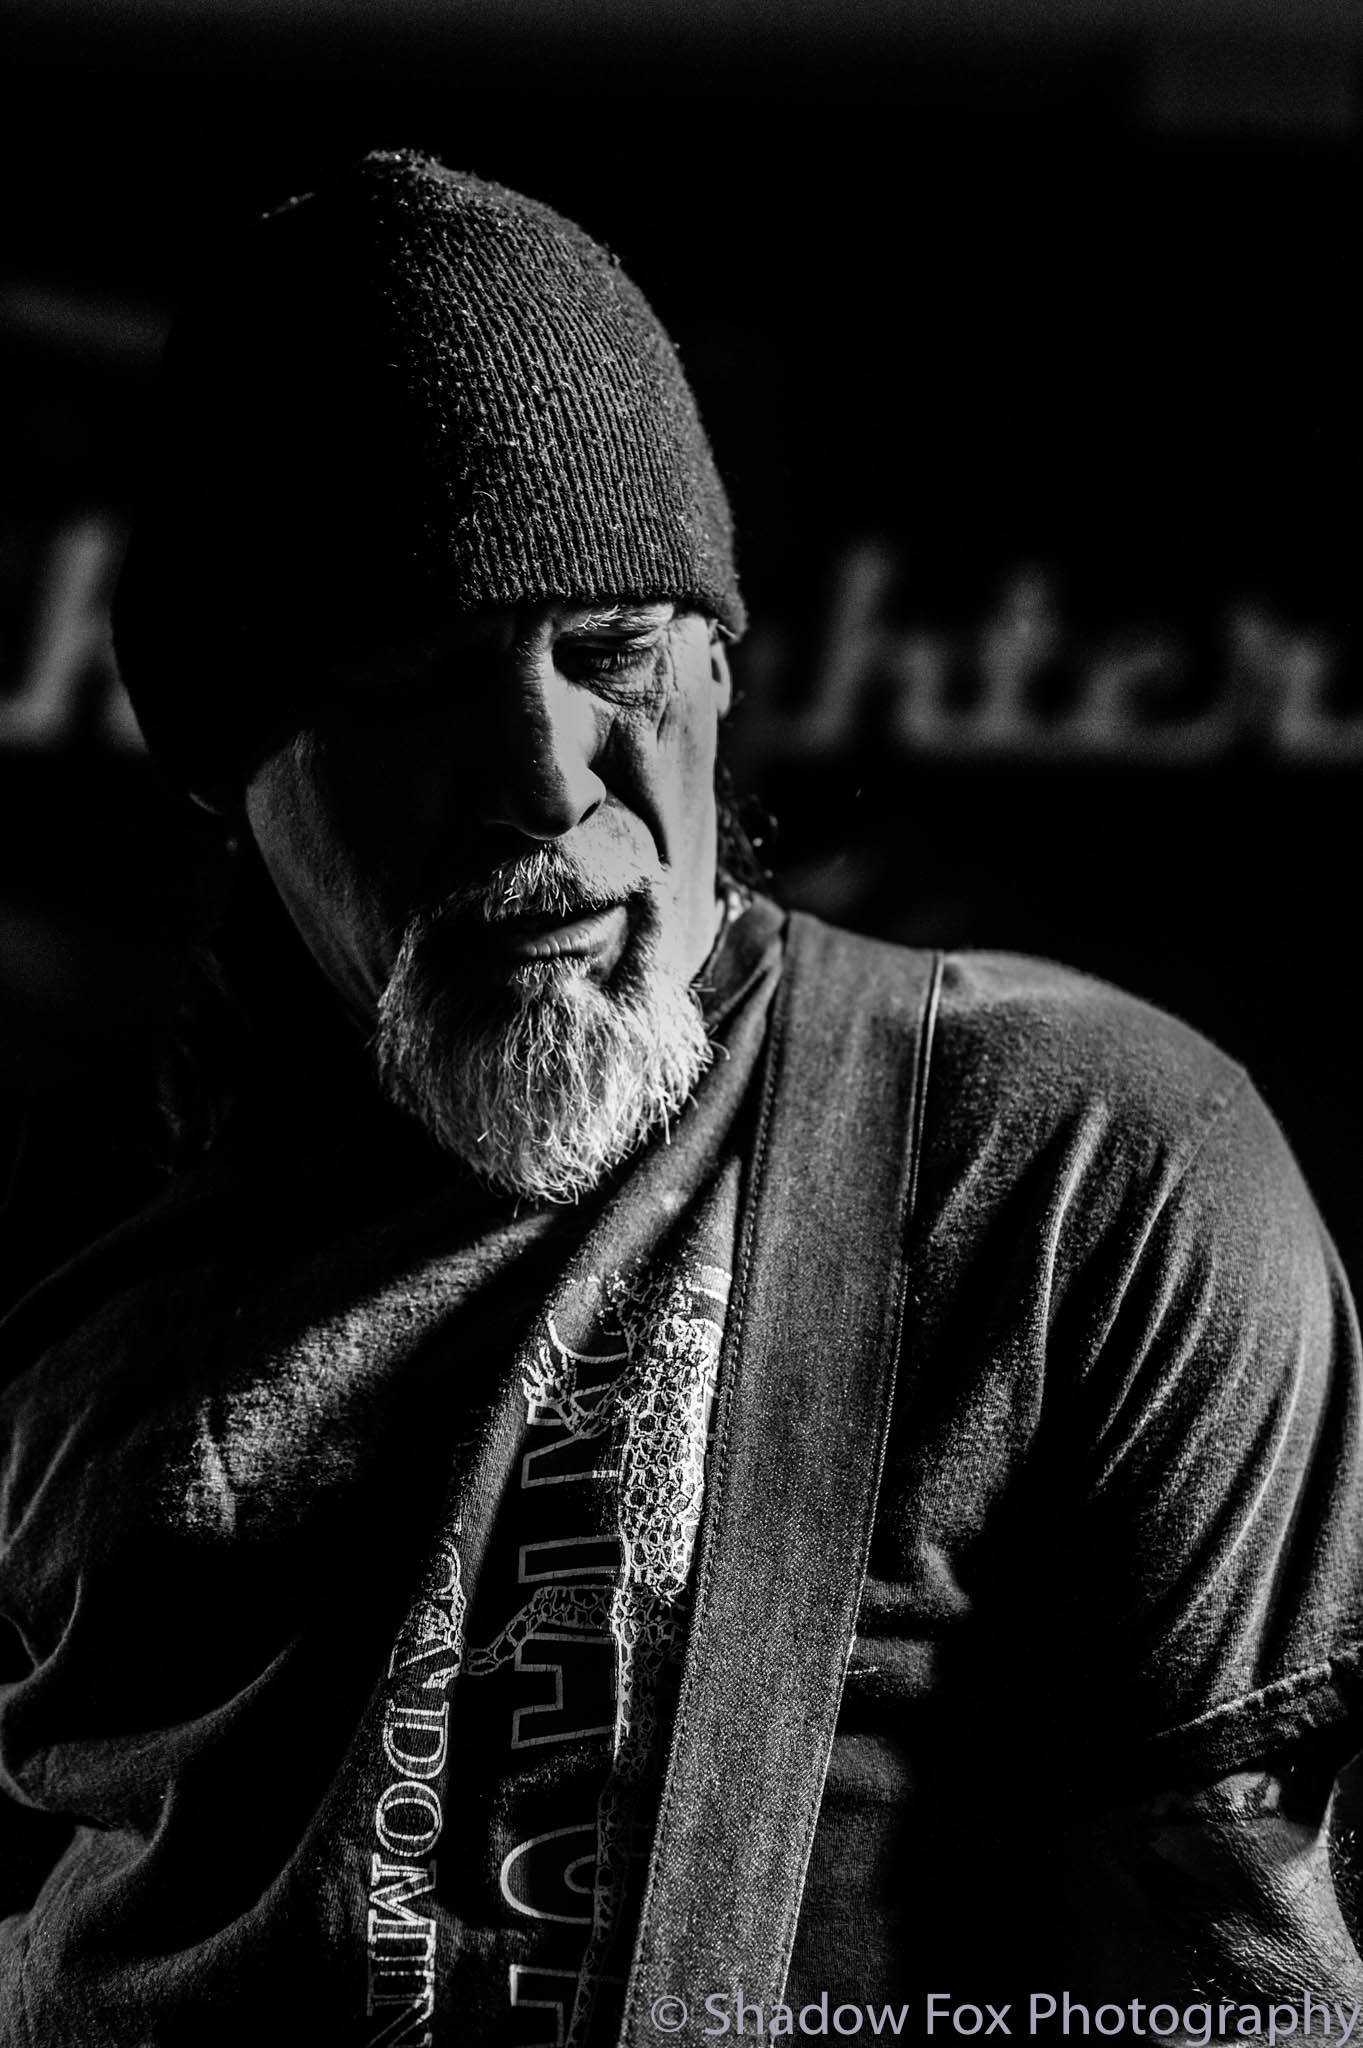 Old Man's Curse playing at Cedar River Landing in Cedar Rapids, Iowa